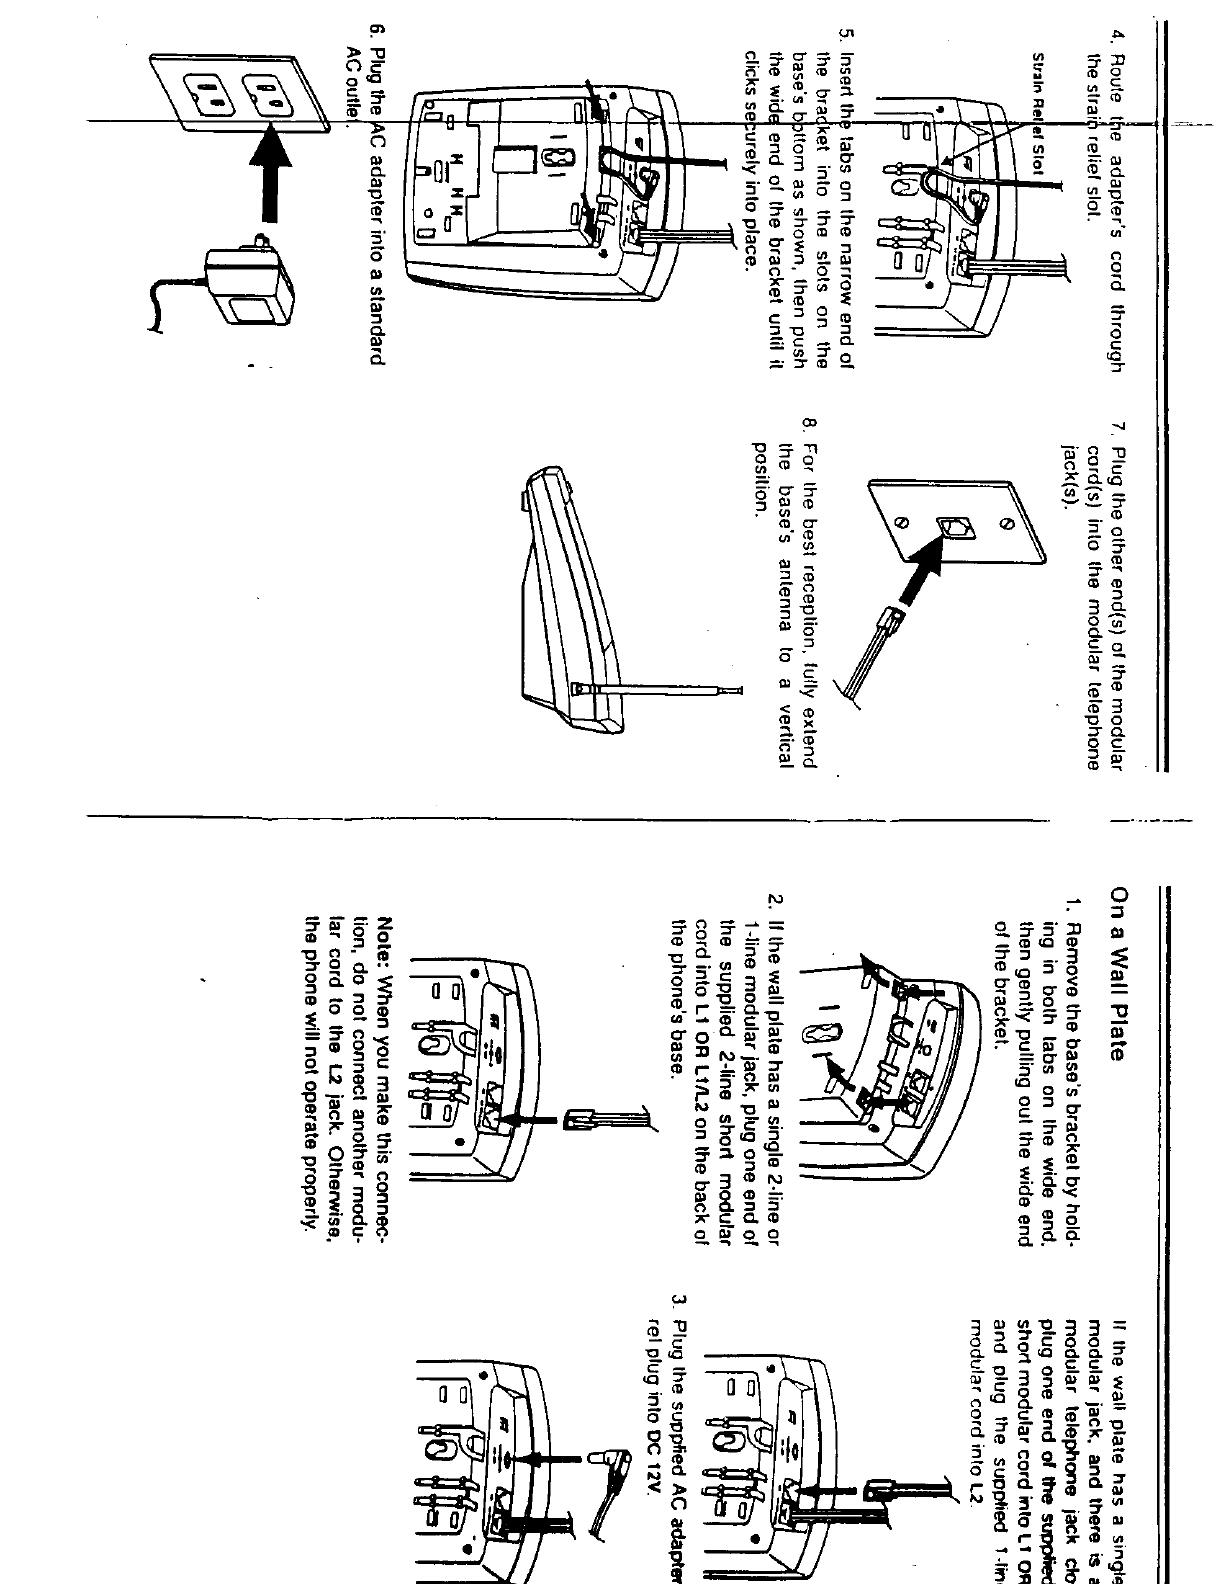 Radio Shack 4300689 900 MHz Cordless Phone User Manual 8